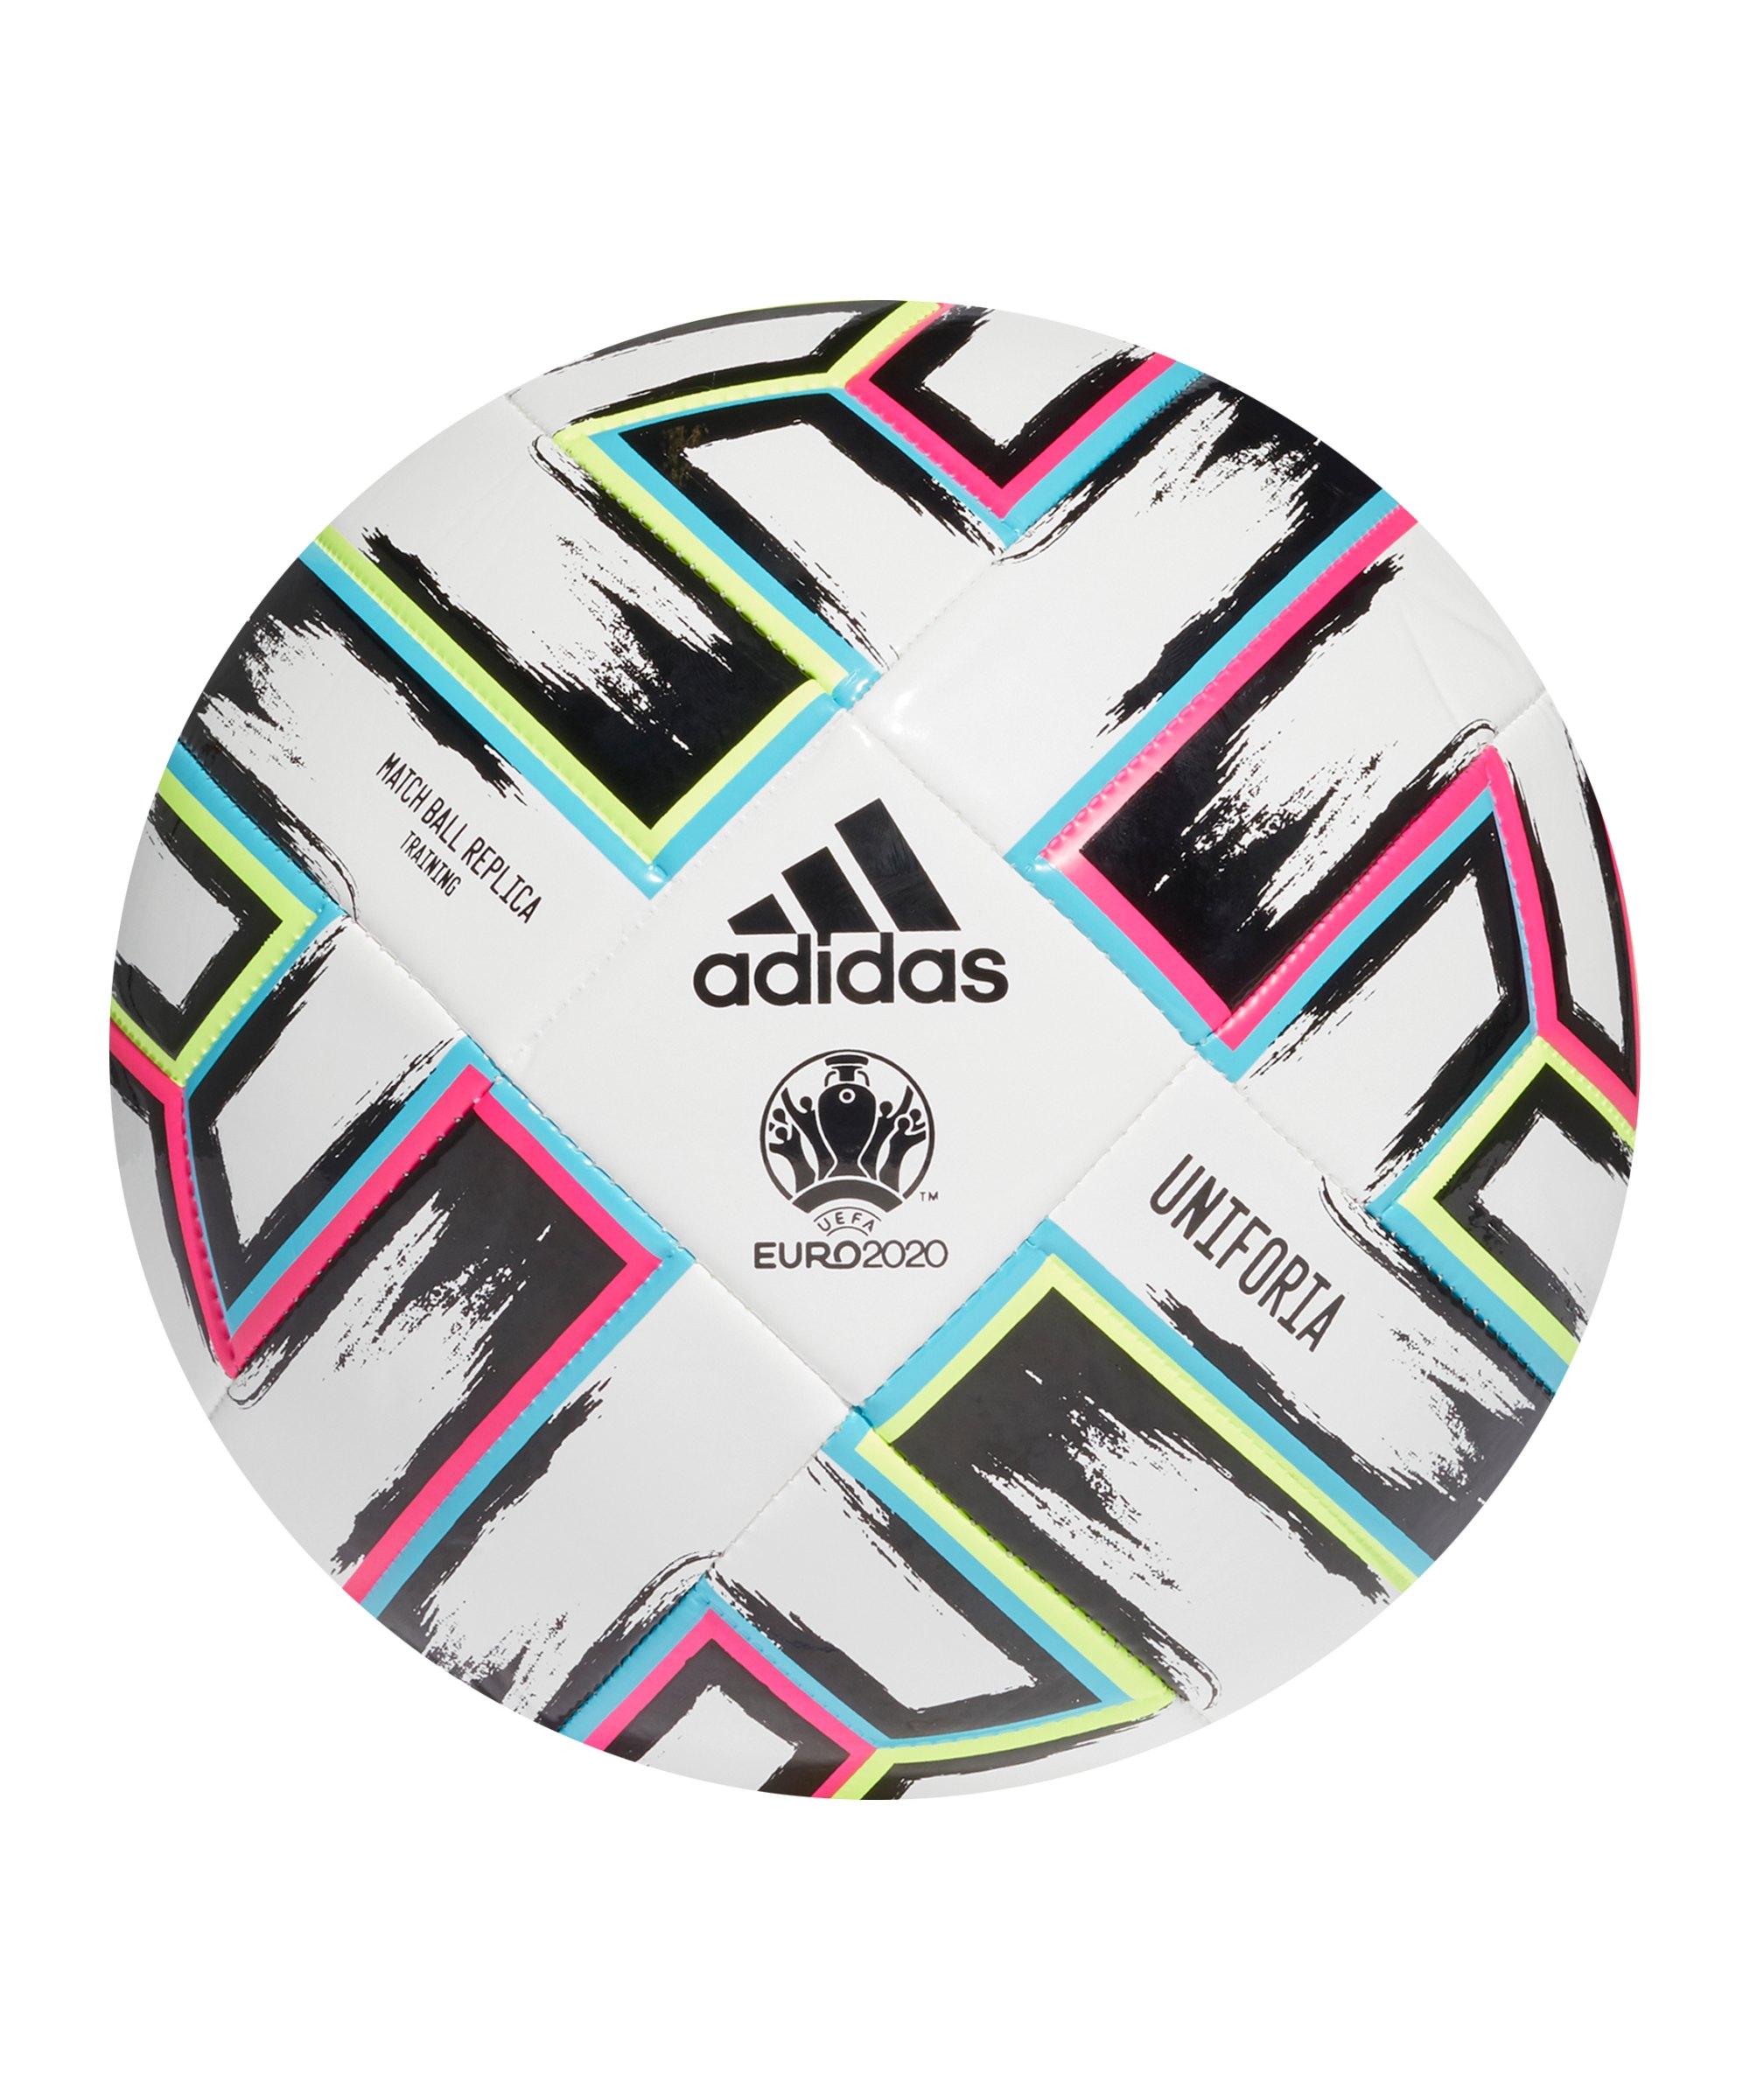 adidas TRN Uniforia Trainingsball Weiss Schwarz - weiss